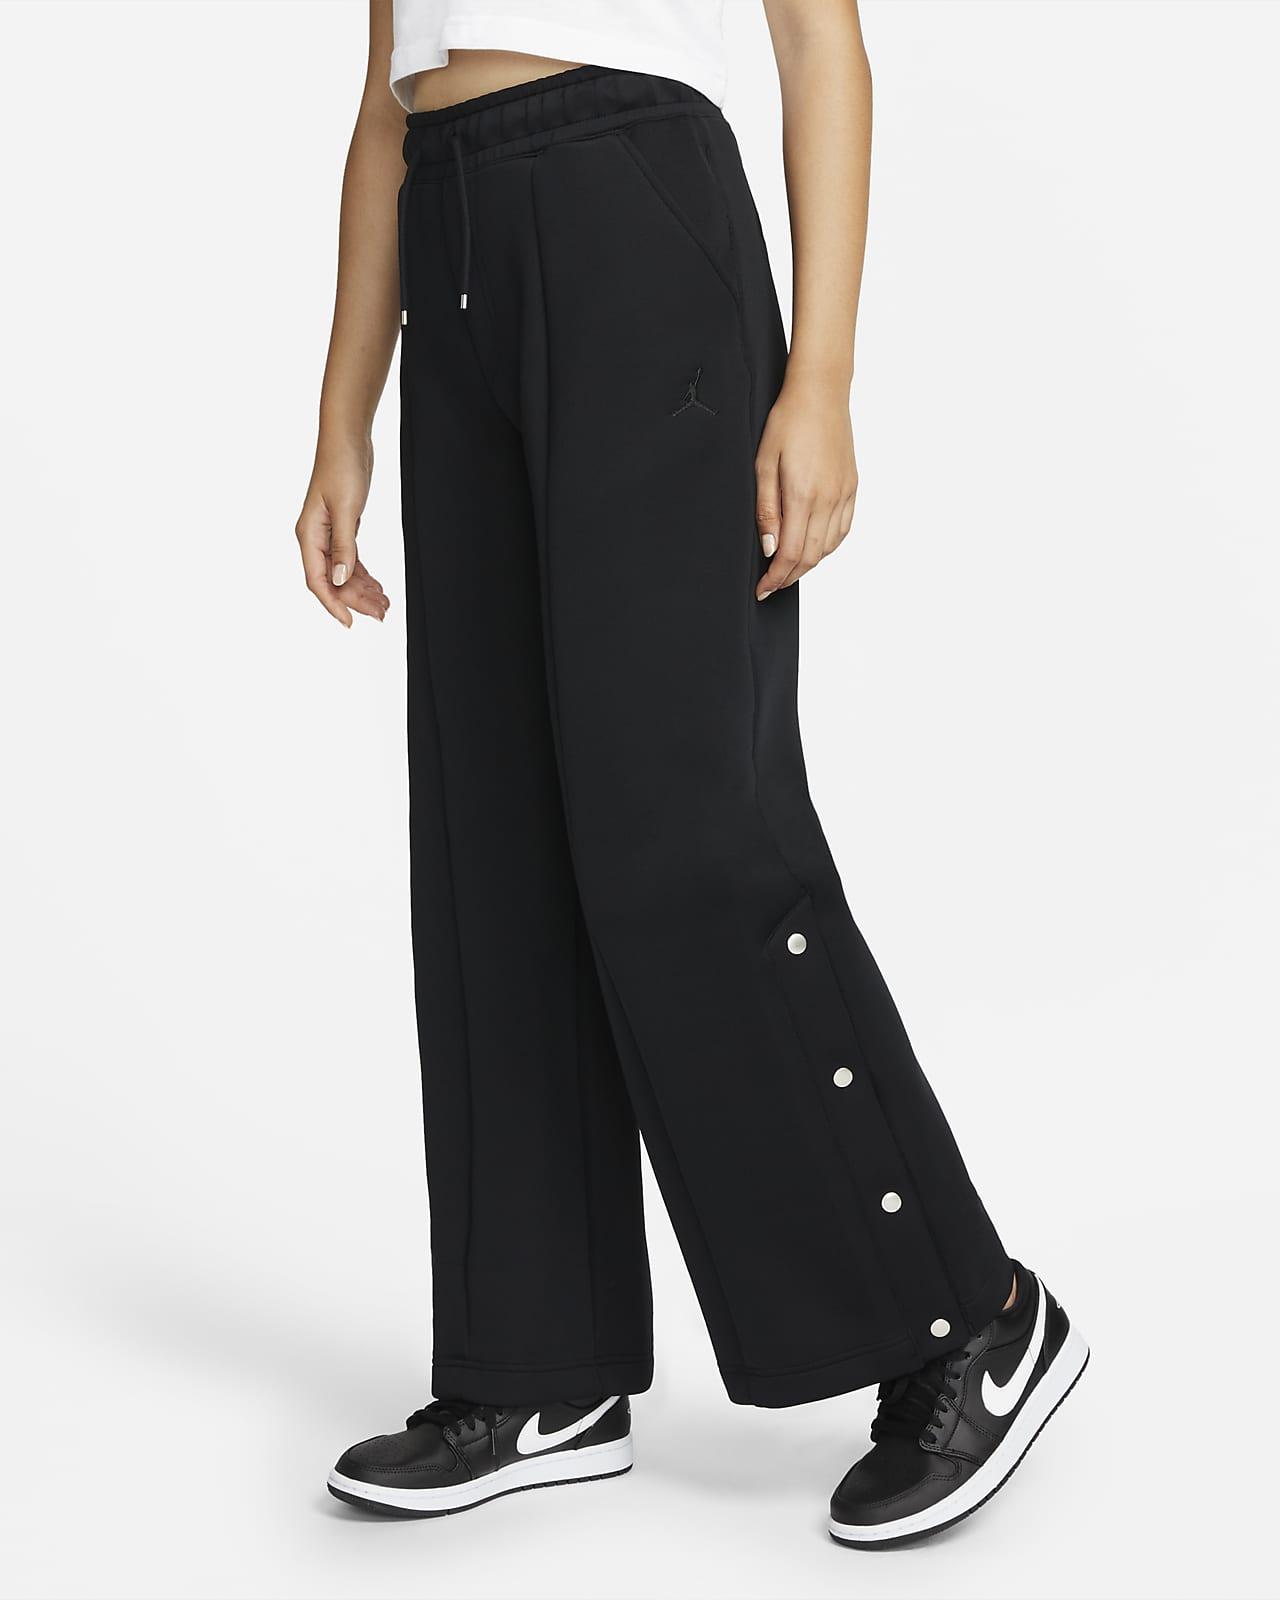 Jordan New Classics Capsule Women's Suit Pants